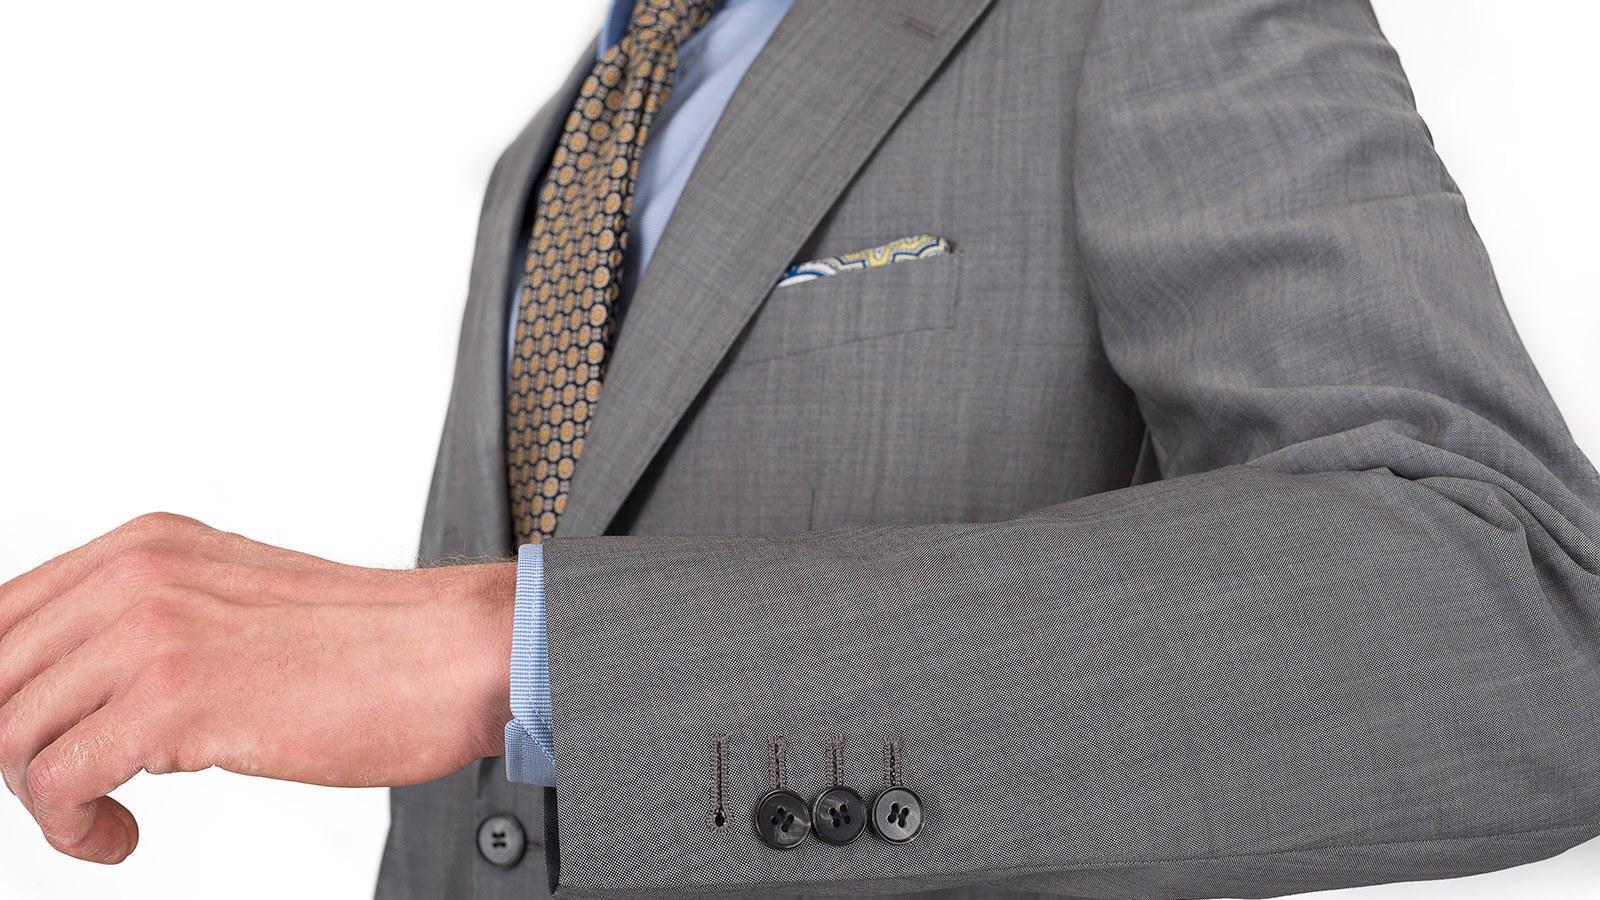 Light Grey Wool & Mohair Suit - slider image 1